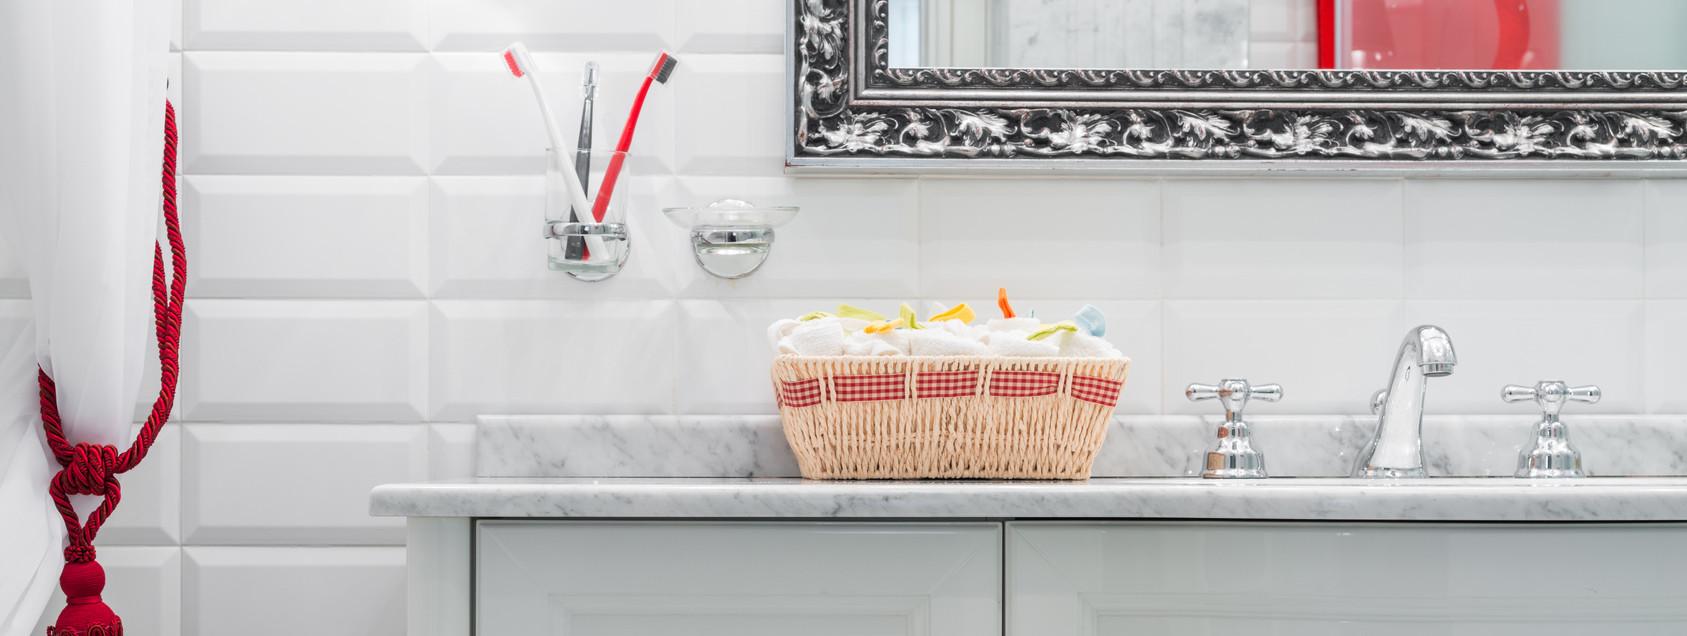 banheiro-acessivel-altura-medida-bancada-banner